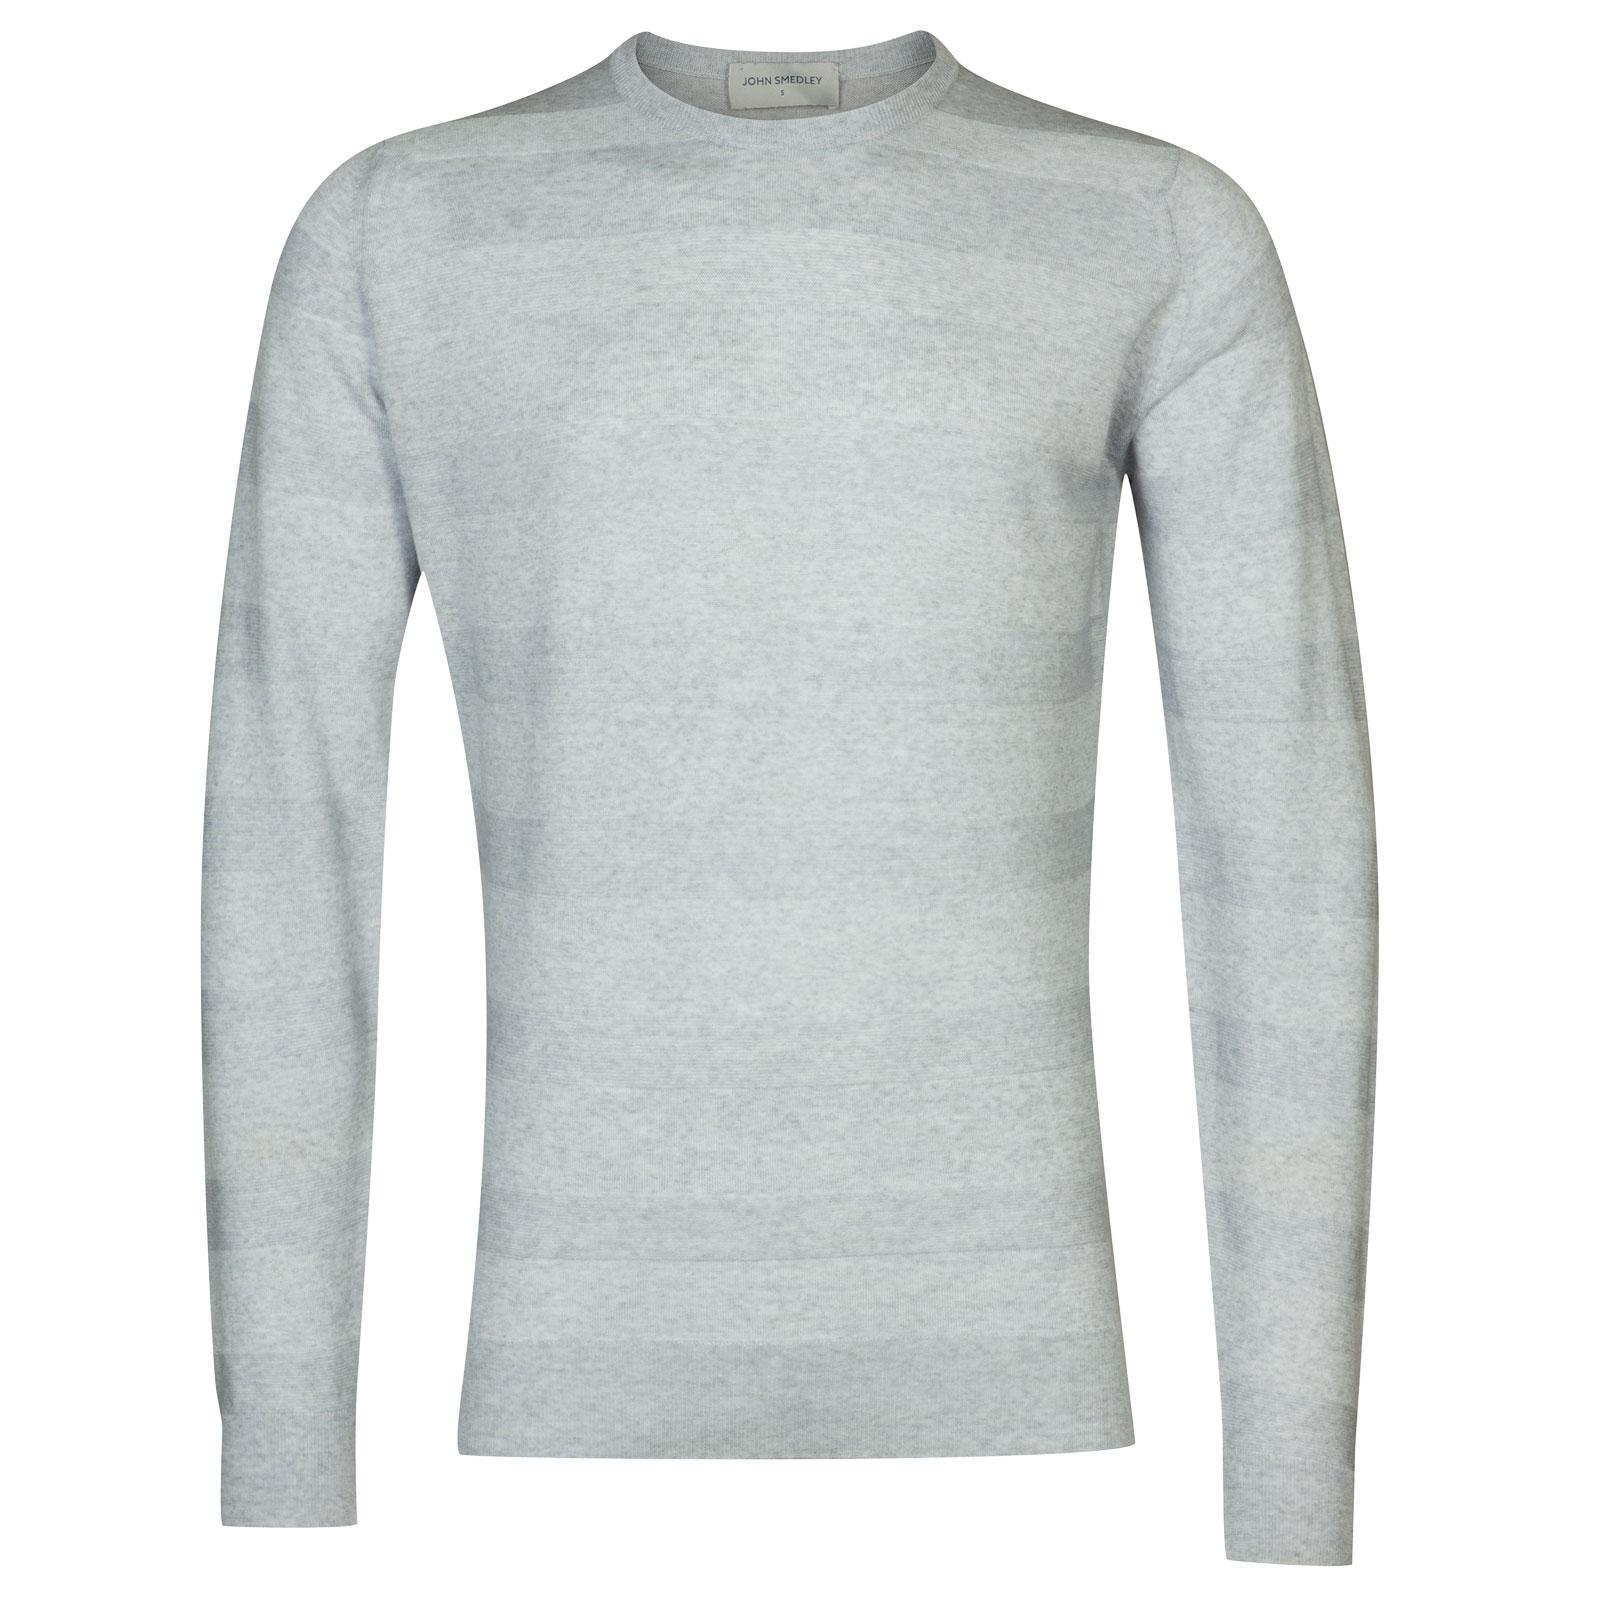 John Smedley coplow Merino Wool Pullover in Bardot Grey-XXL